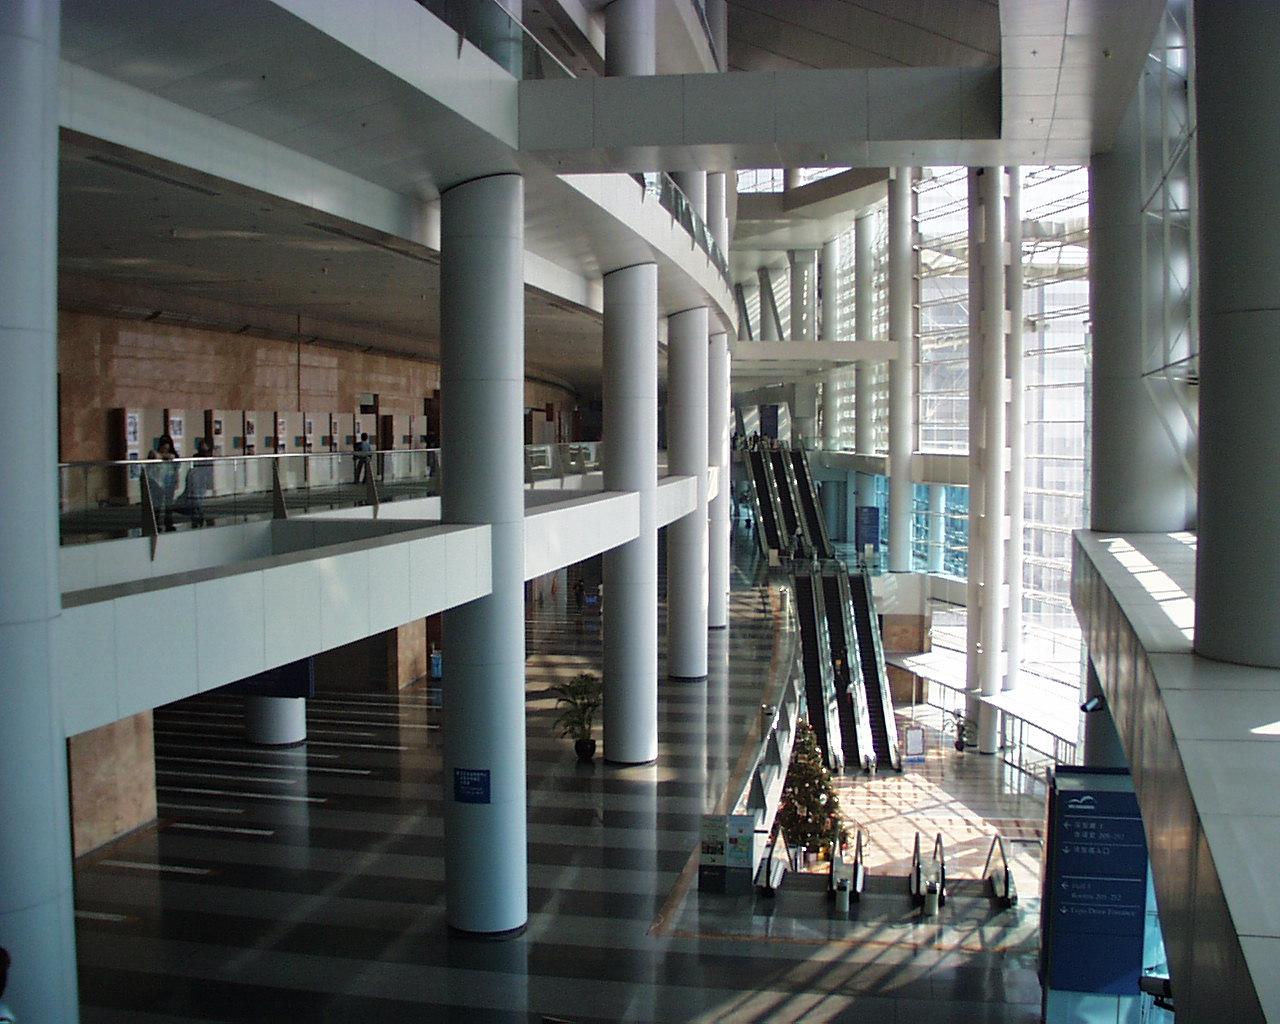 1998-12-31 Hong Kong